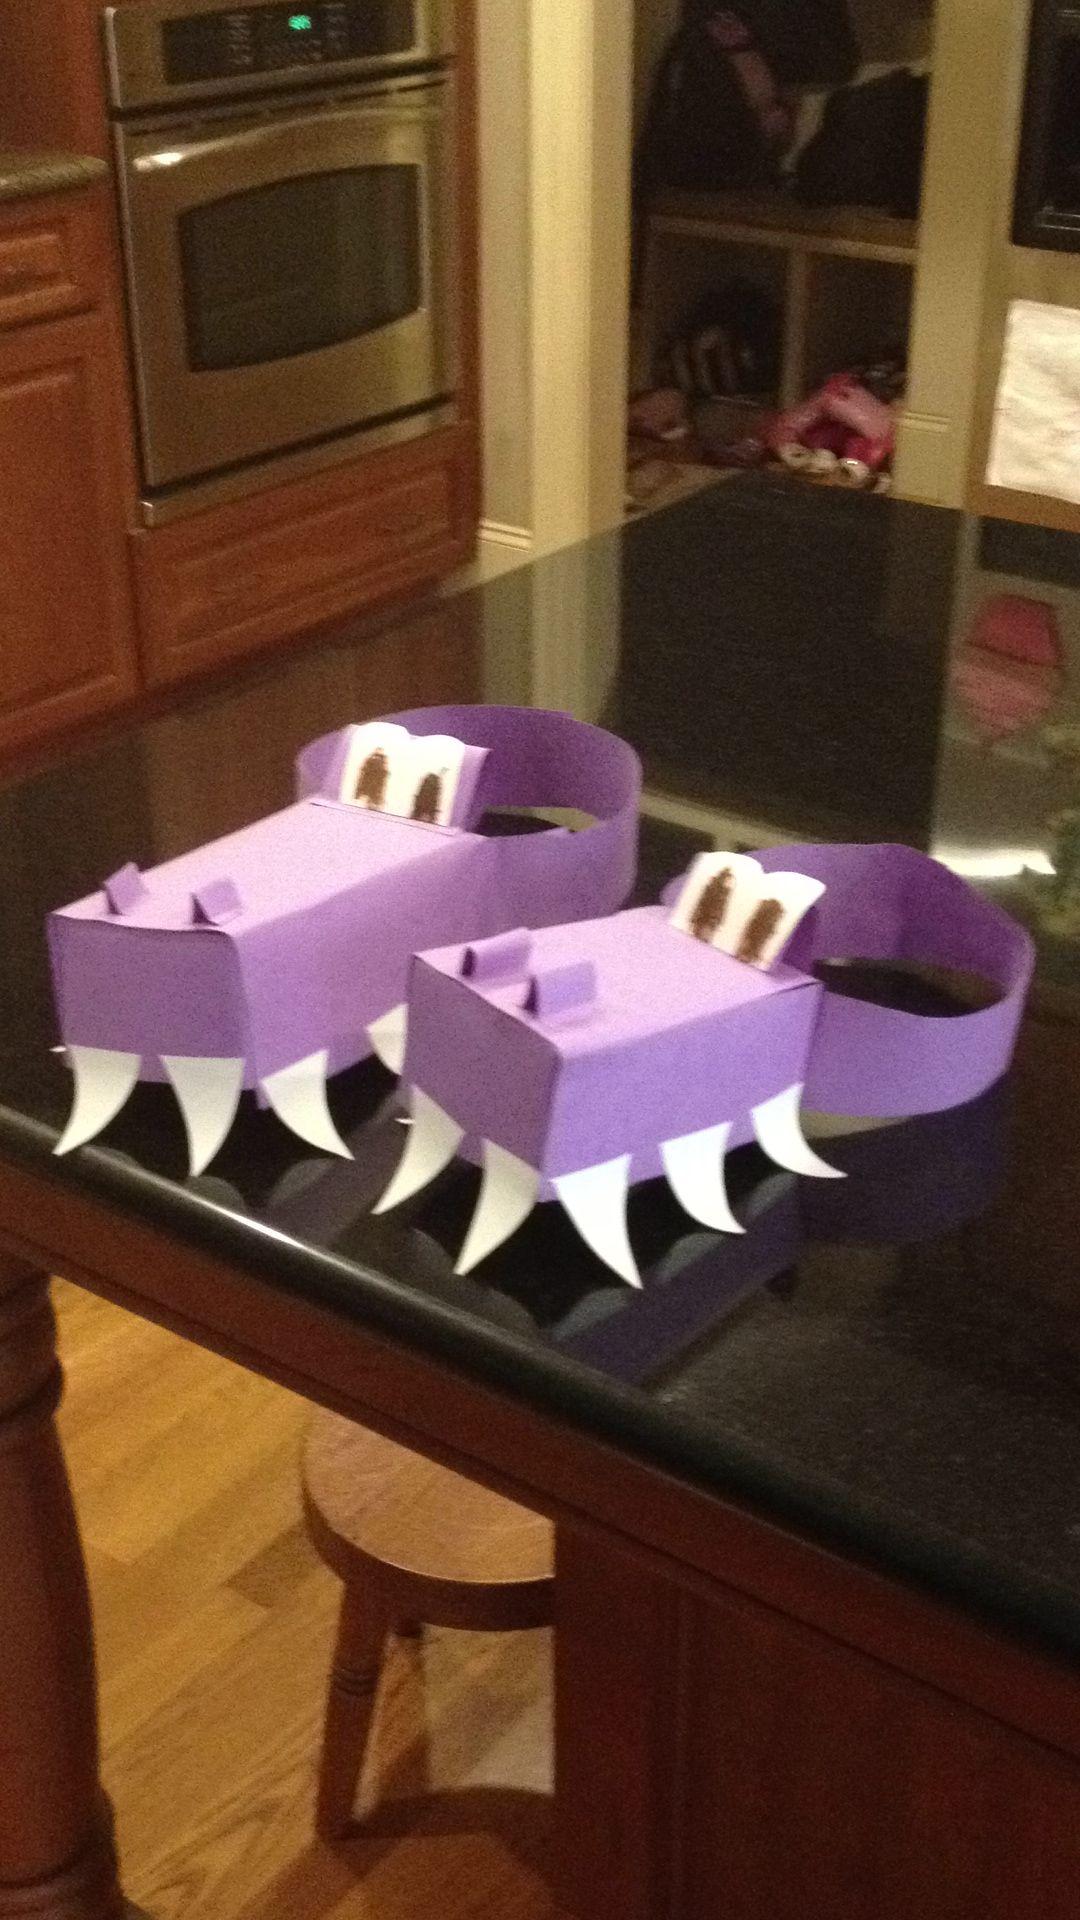 Construction paper crocodile hats Ideas for kids